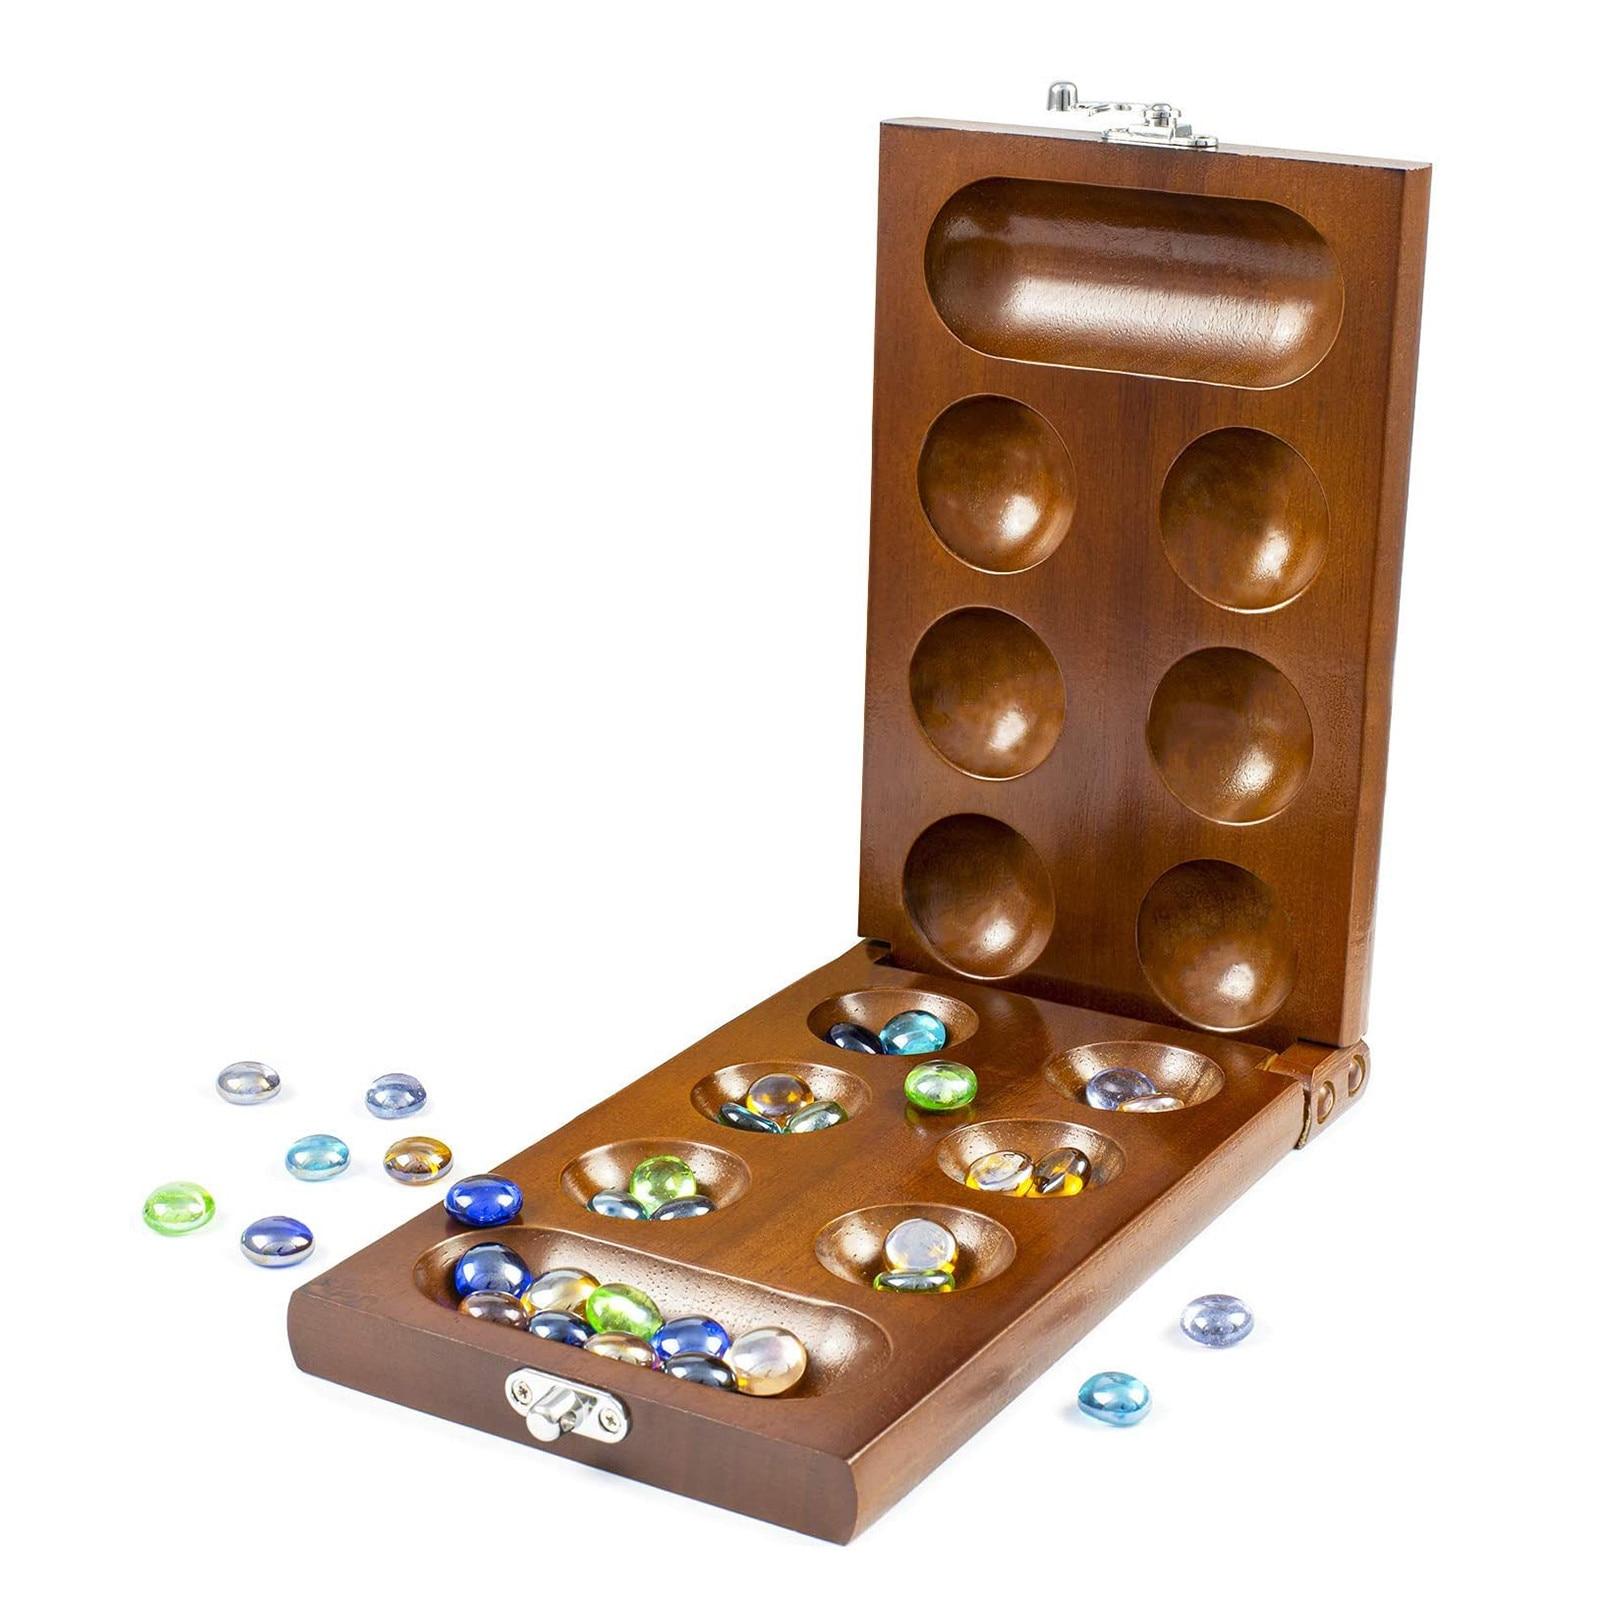 Mancala مجلس لعبة بالحجارة الصلبة الخشب بالغين أطفال لغز لعبة Mancala مجلس لعبة بالحجارة الصلبة الخشب بالغين أطفال لغز